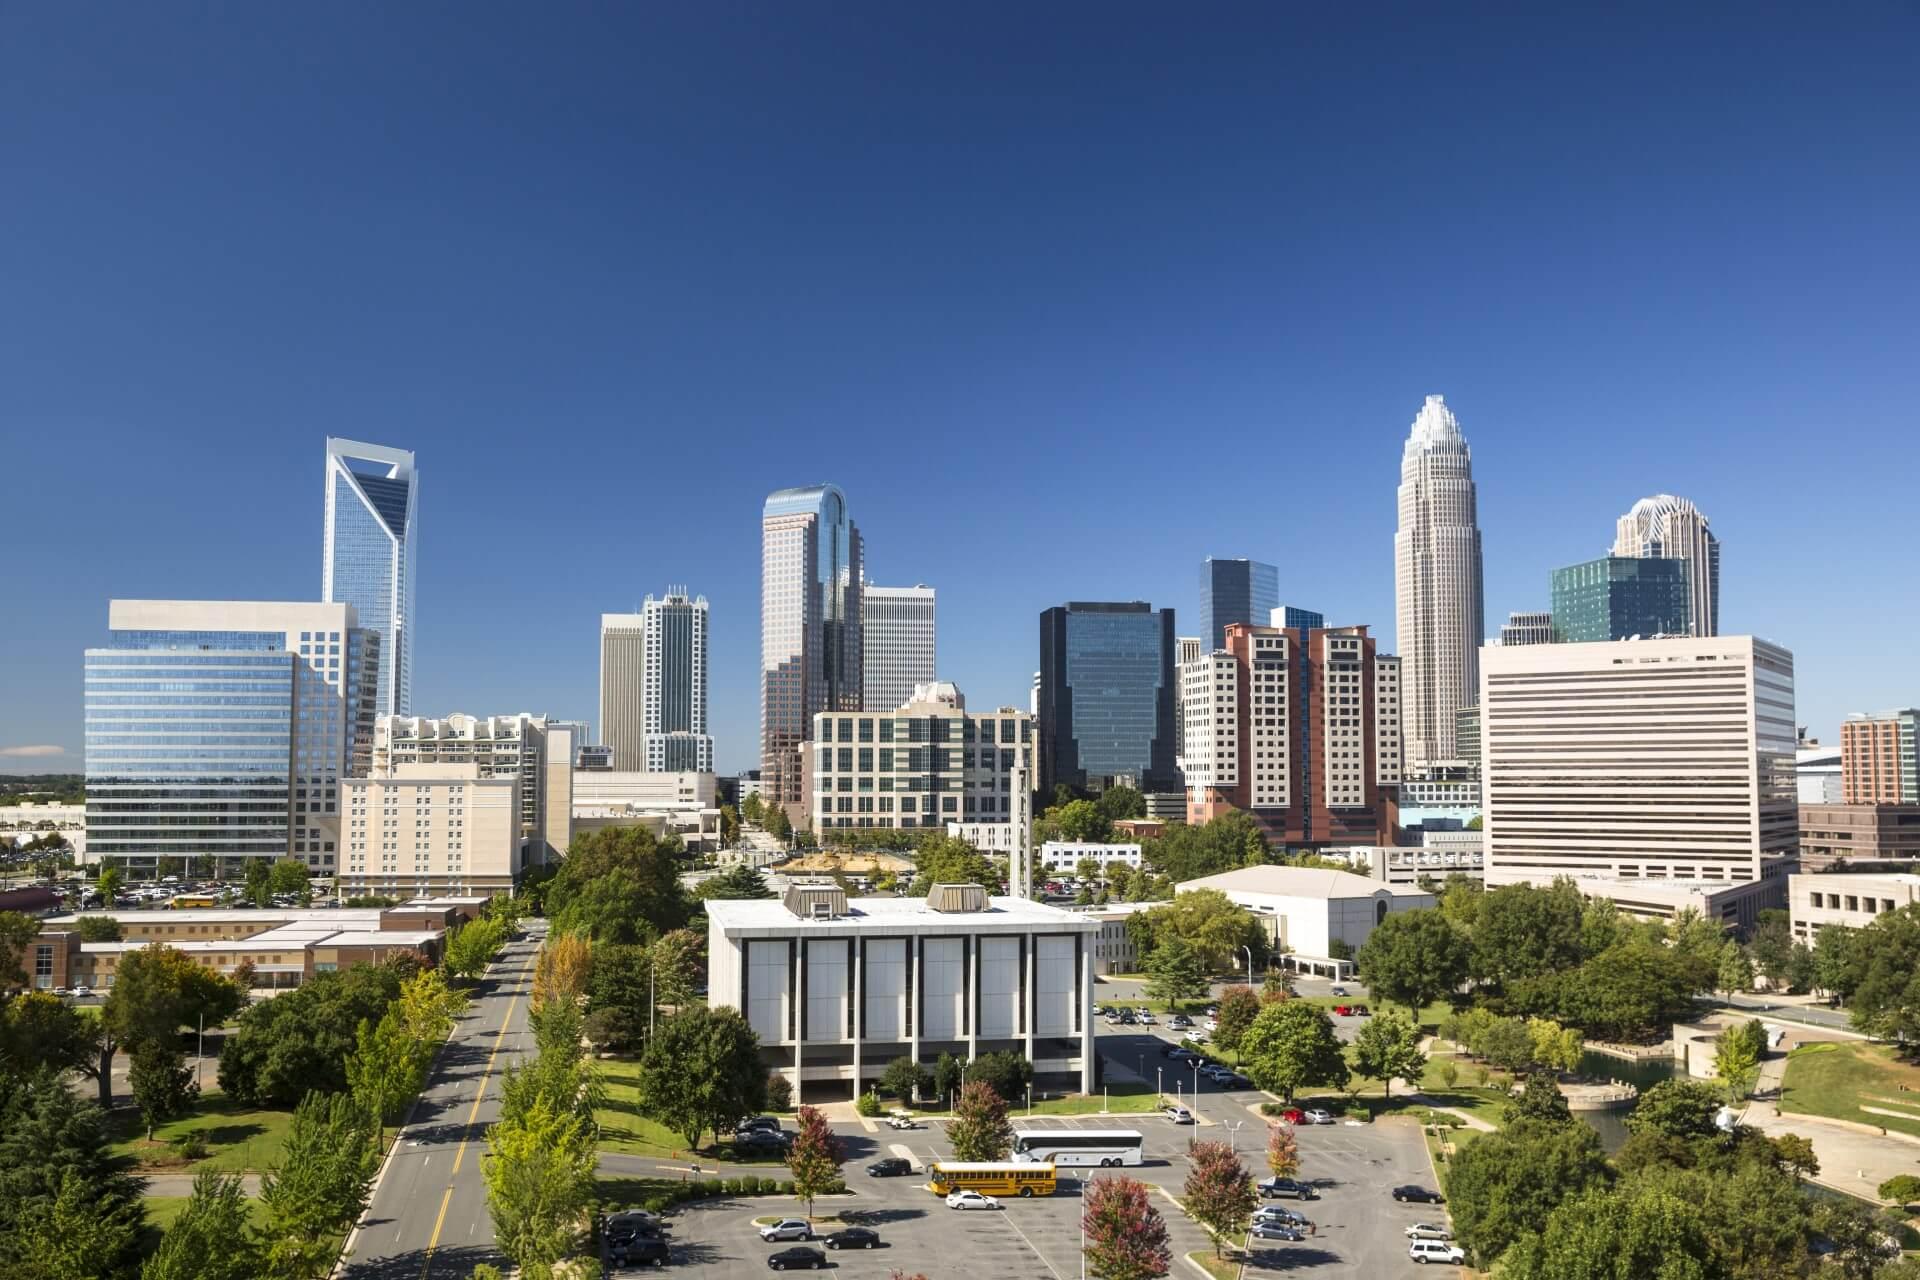 A shot of the Charlotte city skyline.